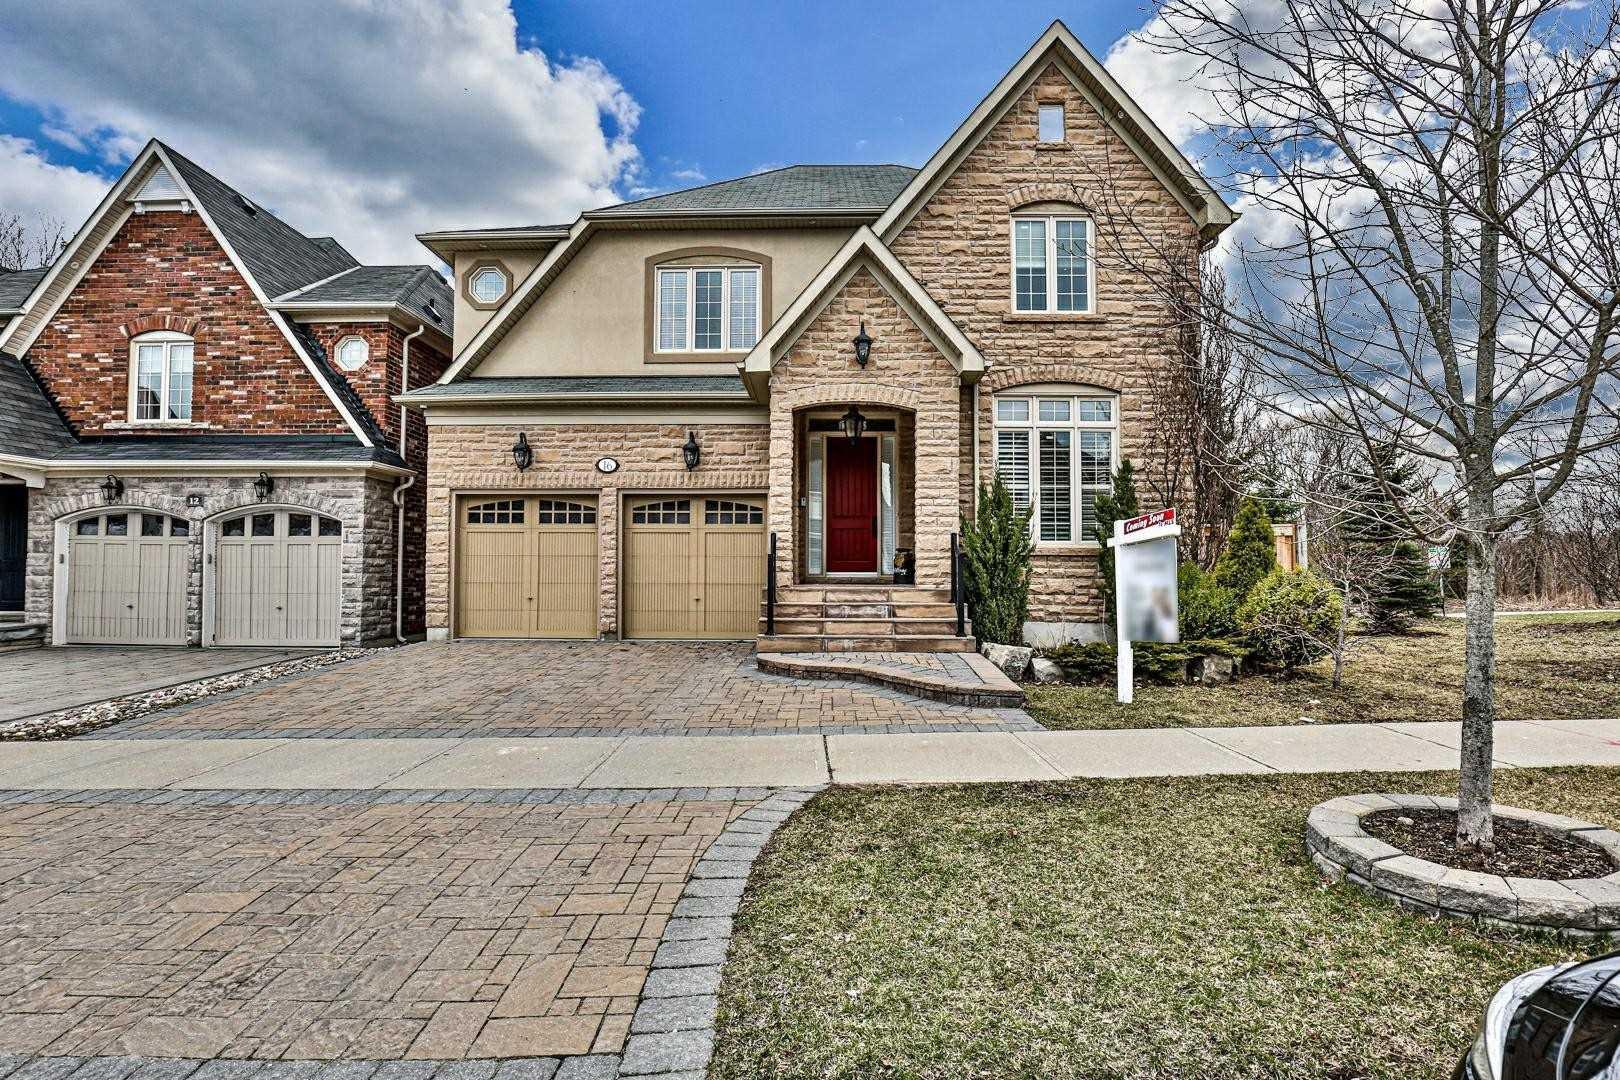 Main Photo: 16 Yorkton Boulevard in Markham: Angus Glen House (2-Storey) for sale : MLS®# N4738041